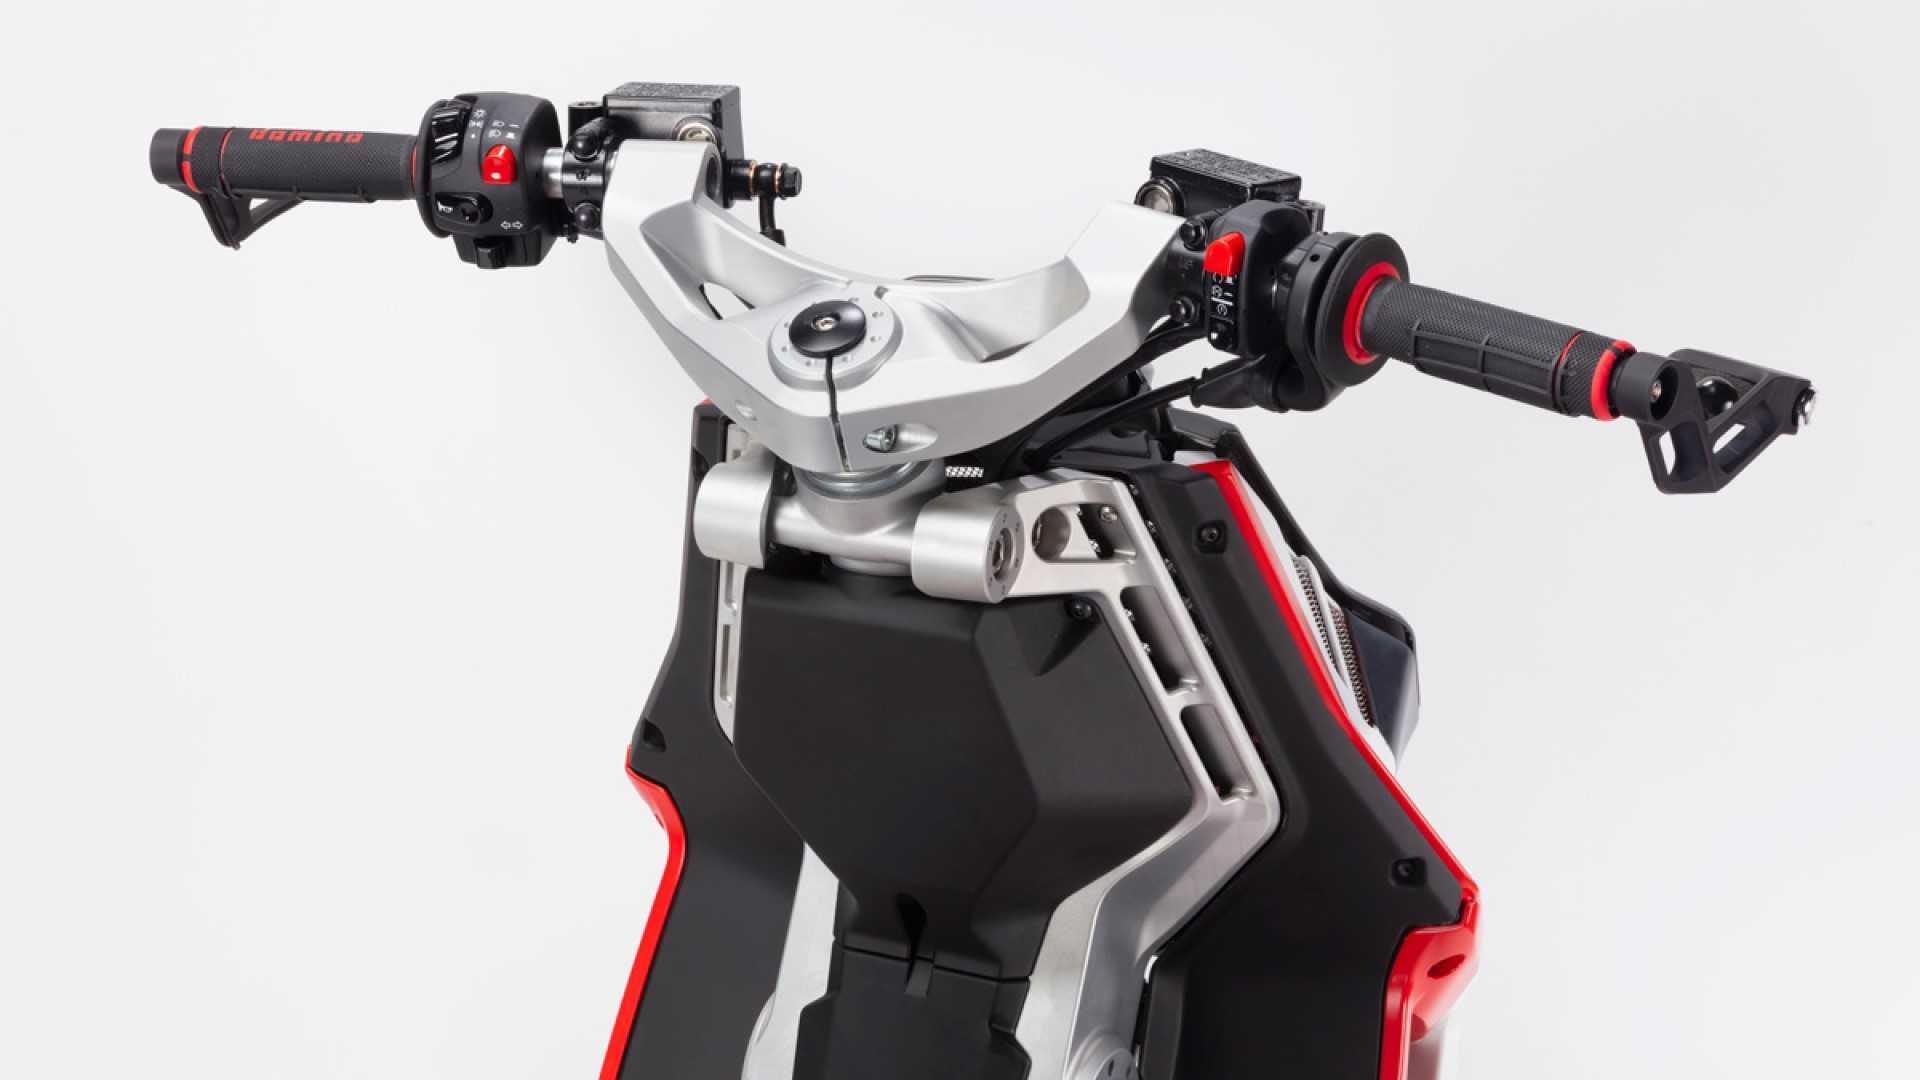 2019-italjet-dragster-9